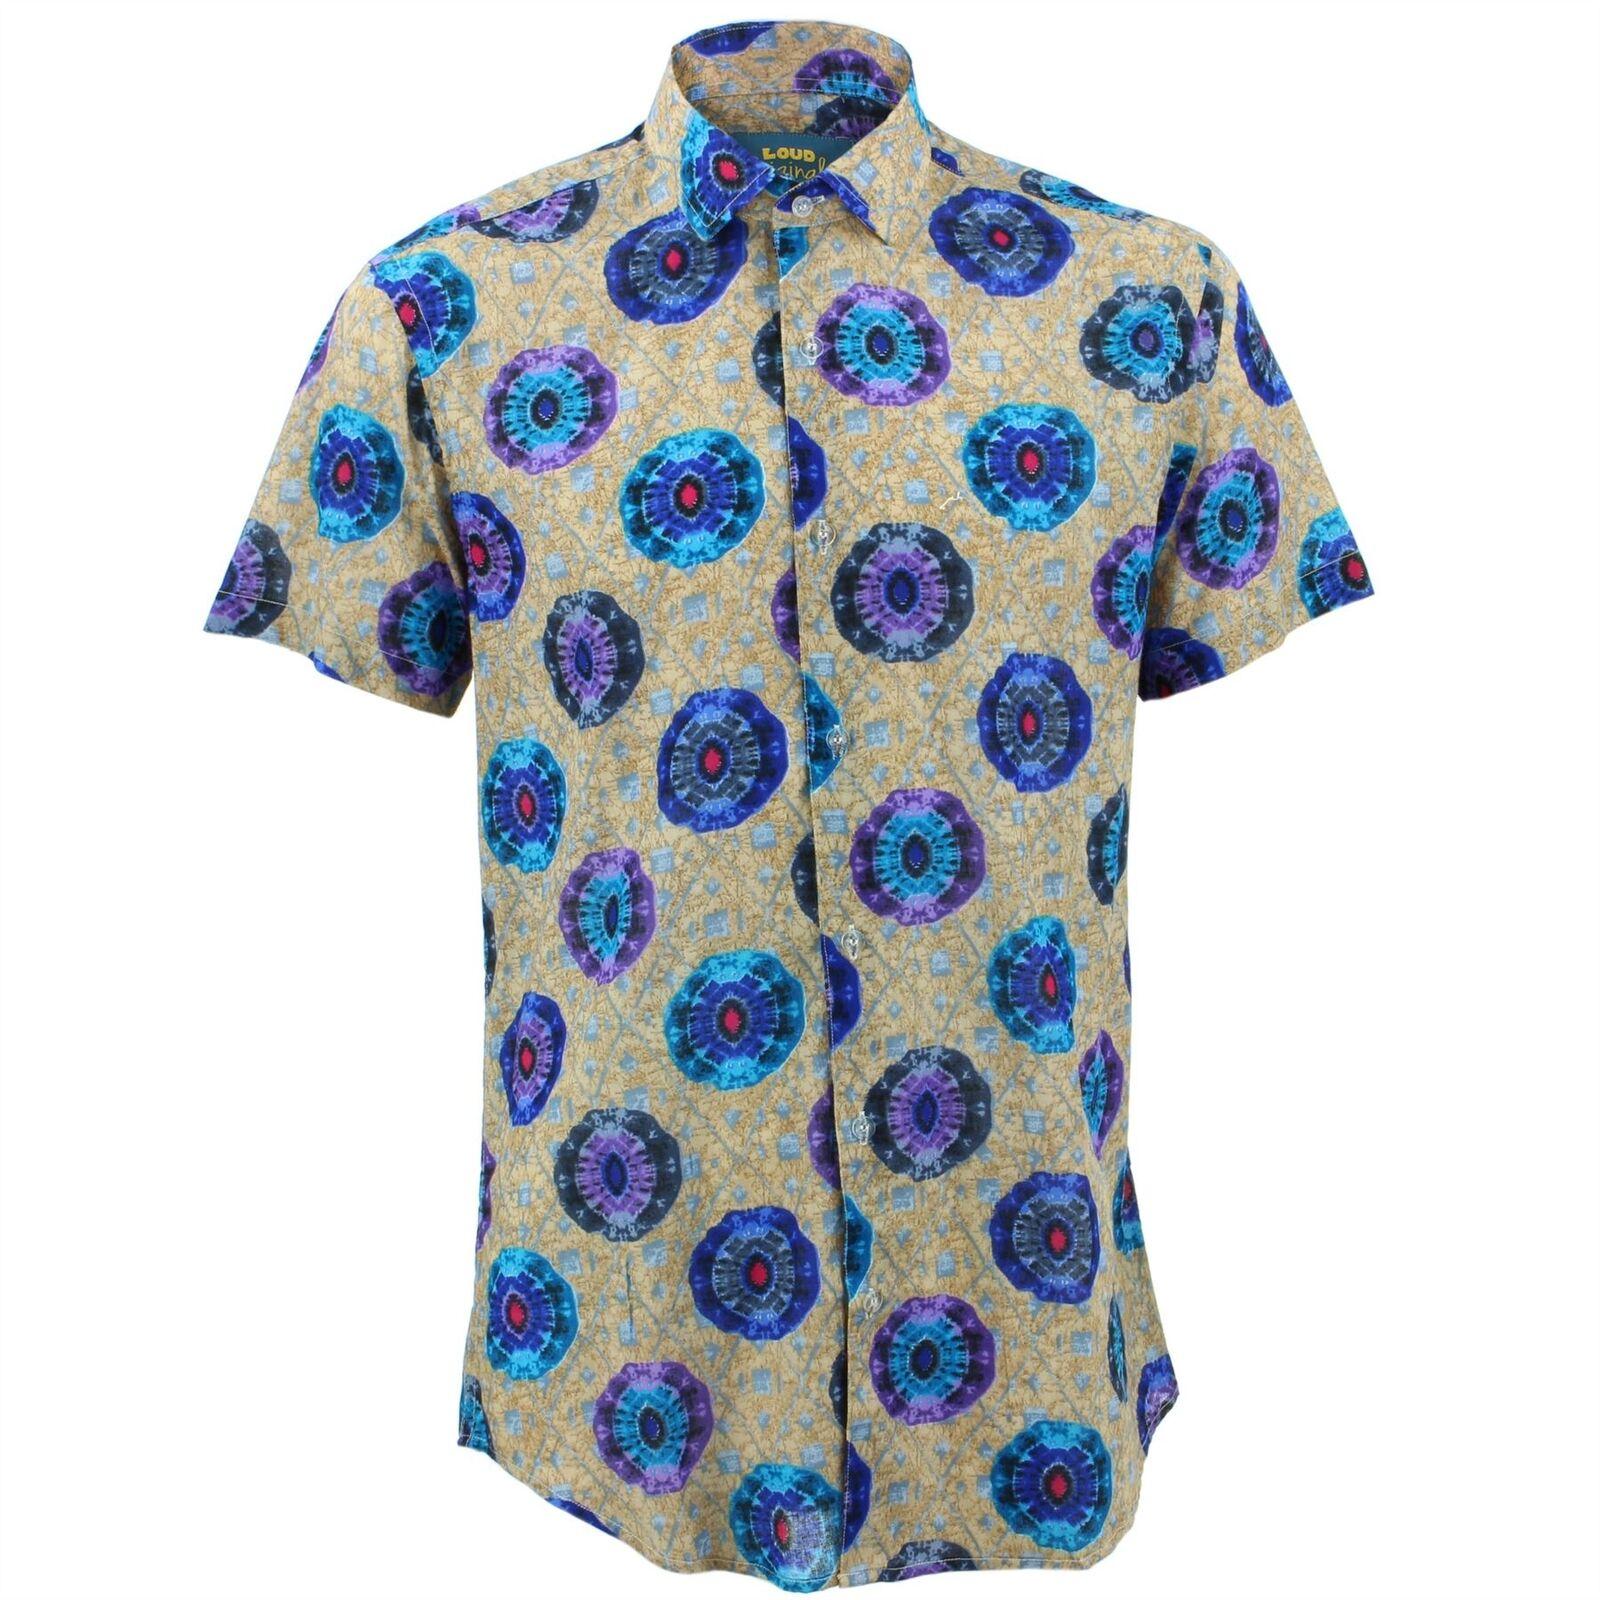 Camicia da Uomo Loud Originals Slim Fit Caleidoscopio Blu Retro Decorato